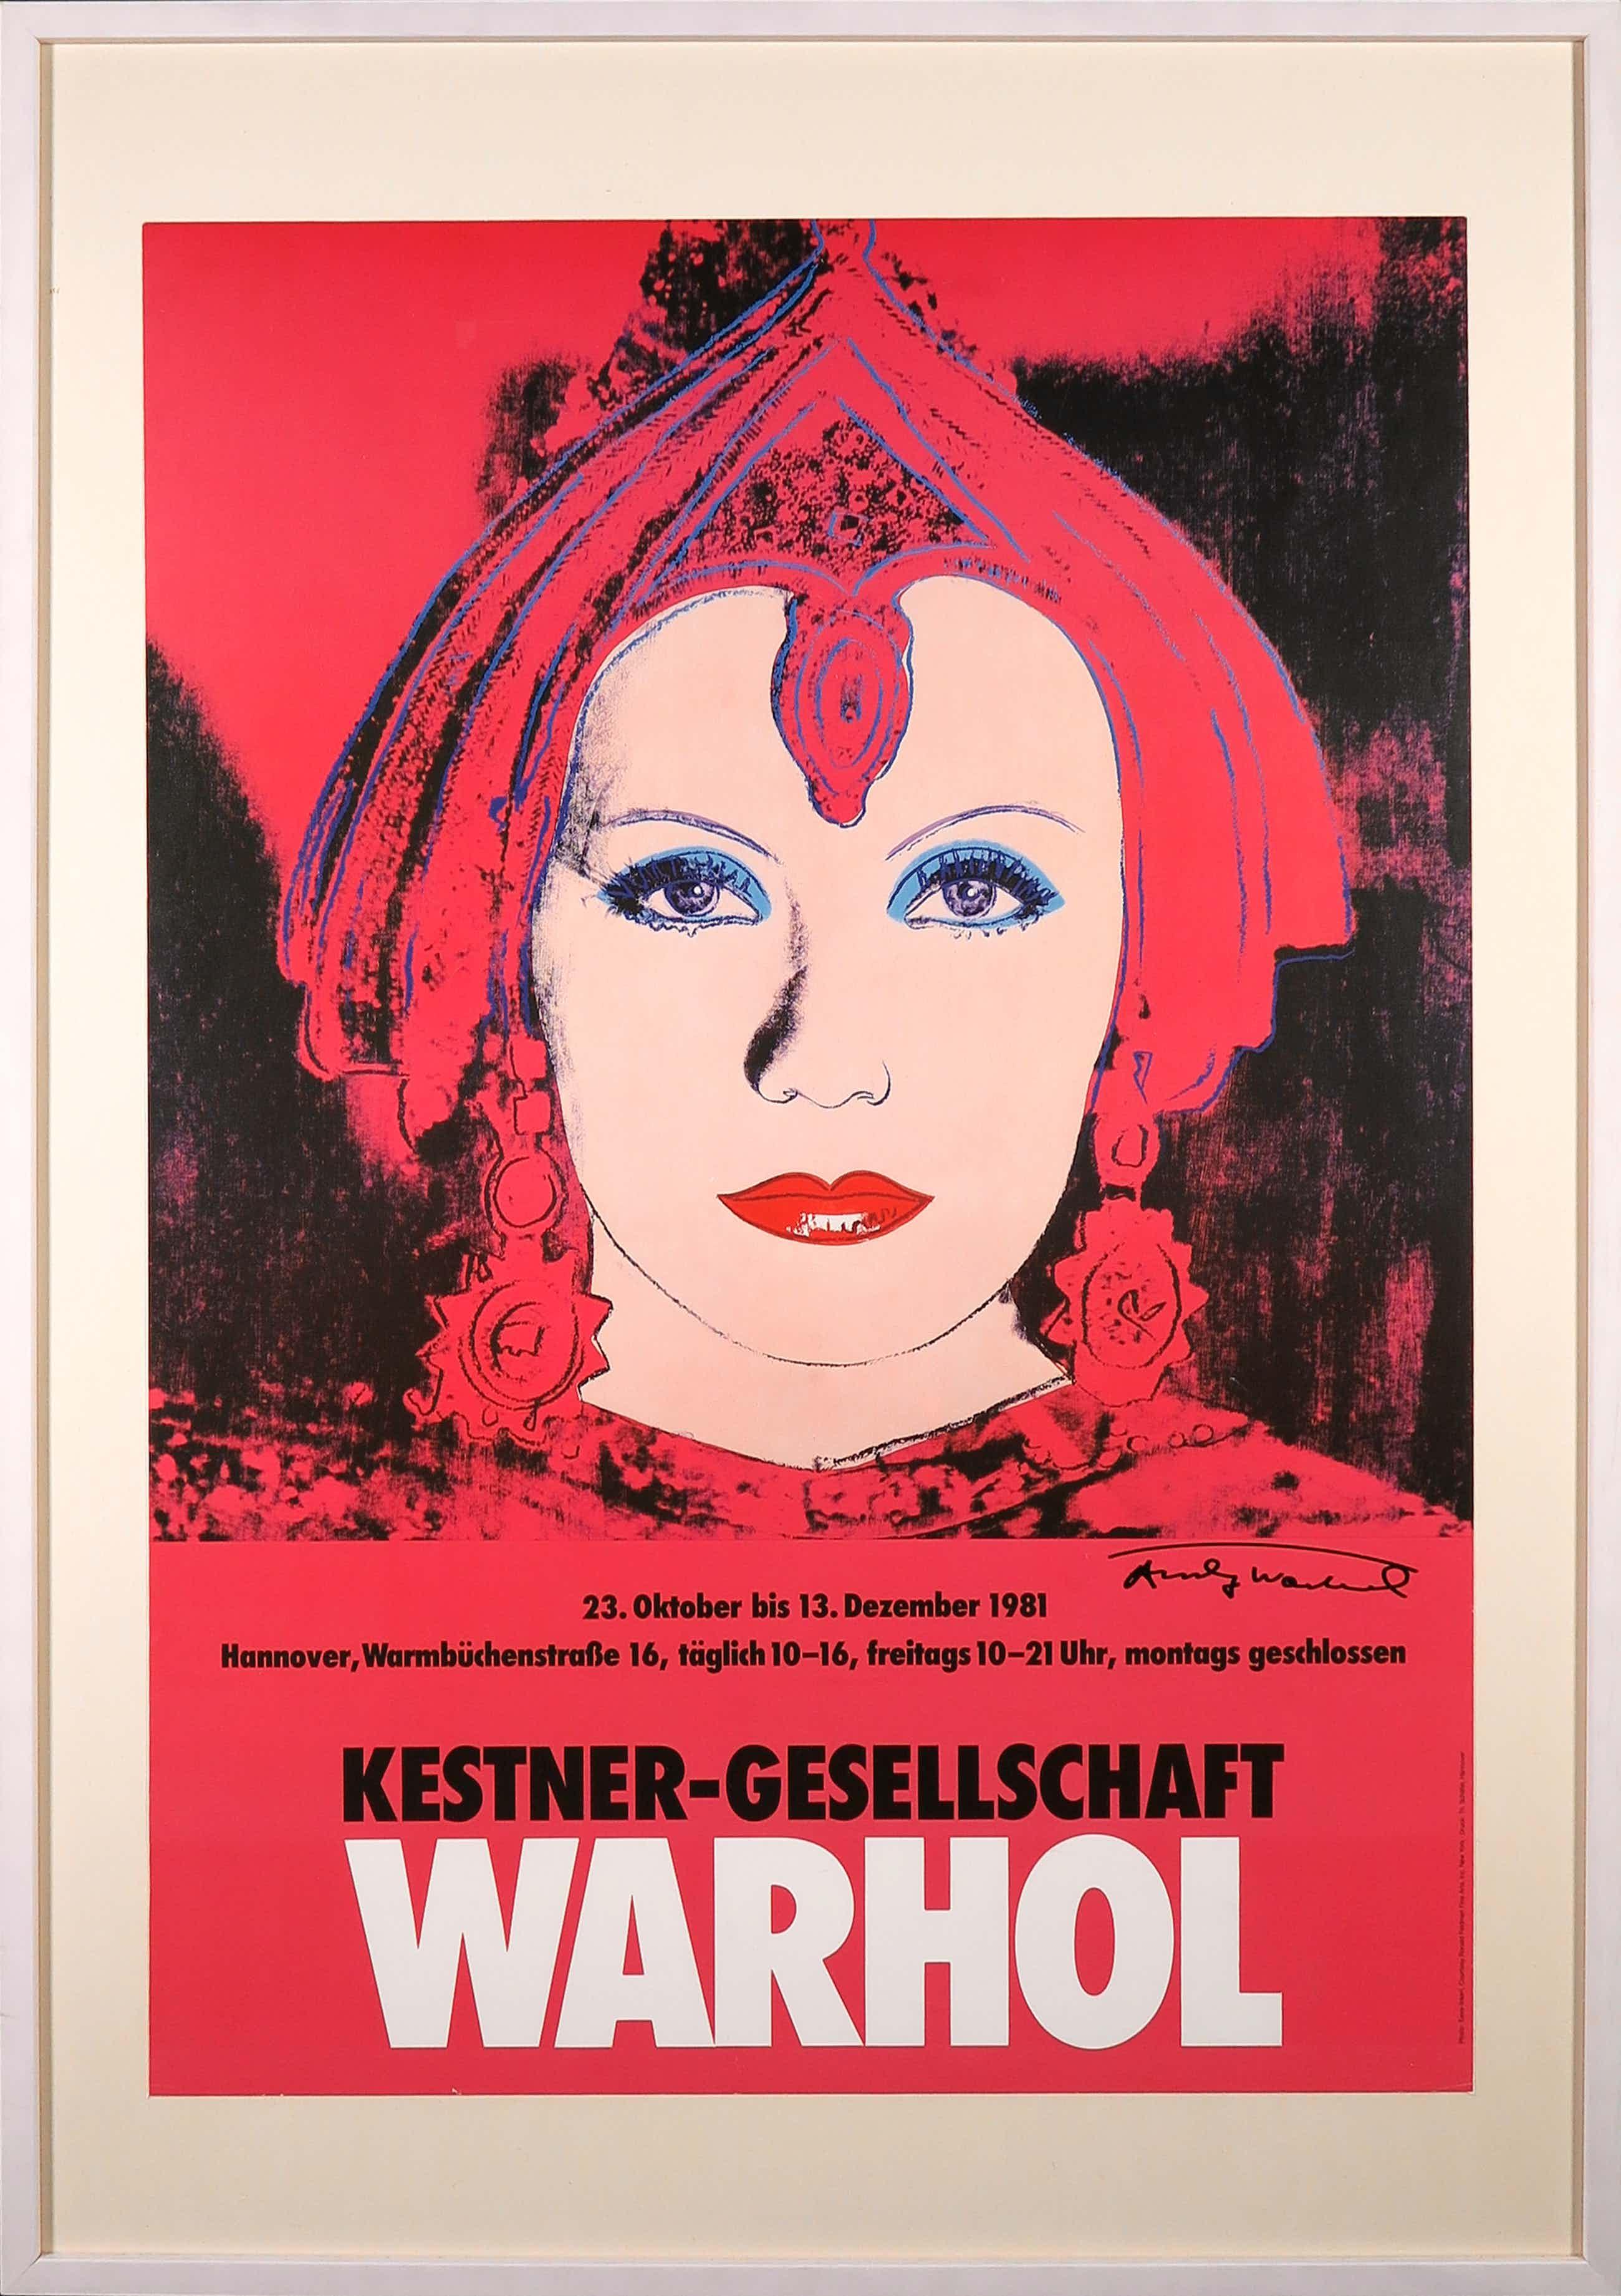 Andy Warhol - Handgesigneerd affiche The Star Kestner-Gesellschaft - Ingelijst (Groot) kopen? Bied vanaf 510!